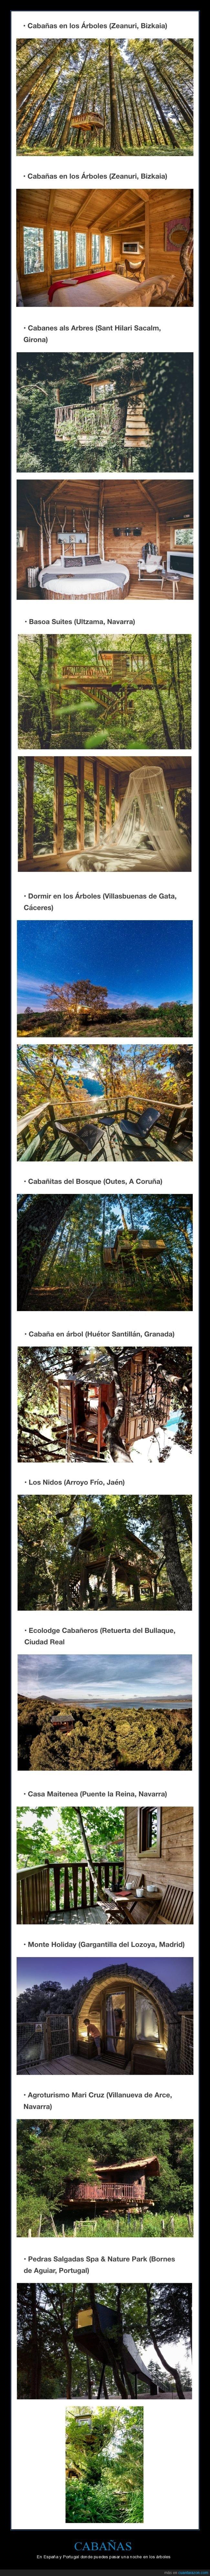 árboles,cabañas